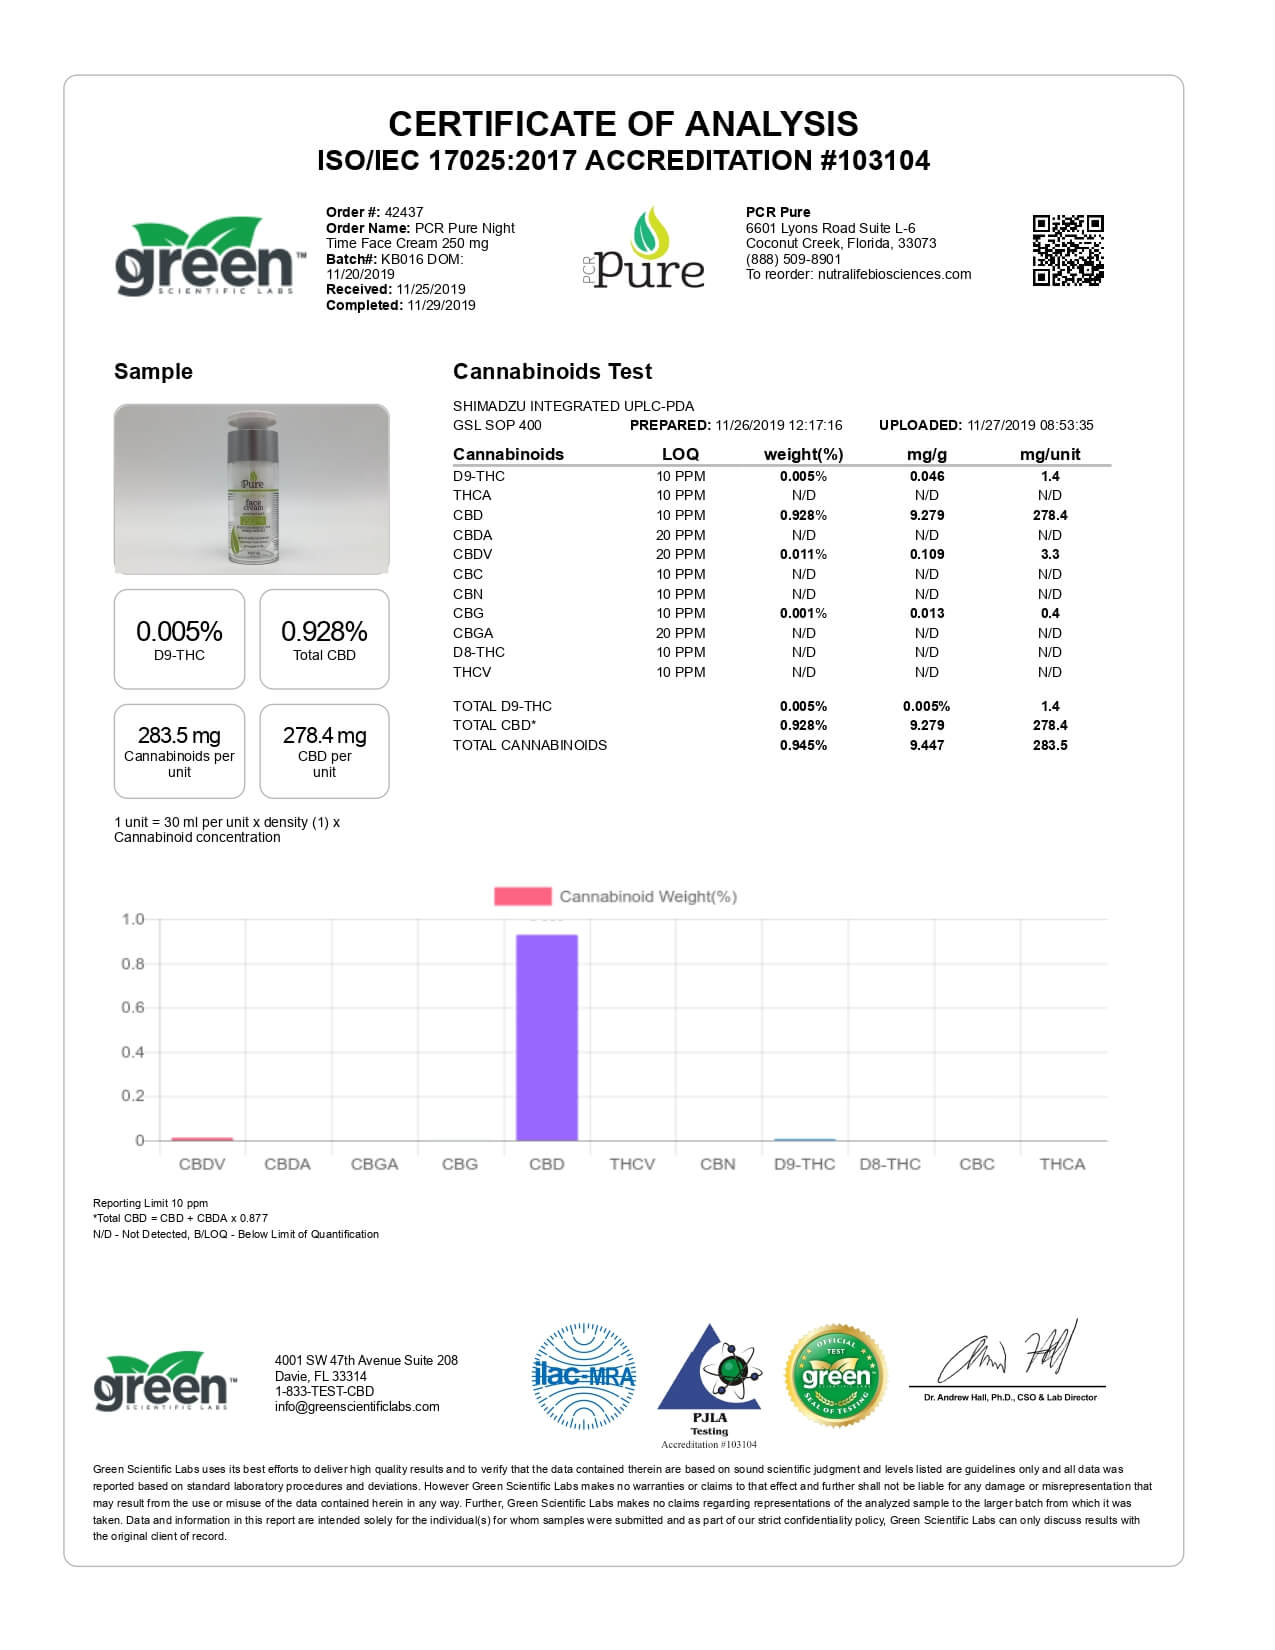 PCR Pure CBD Topical Full Spectrum Nighttime Face Cream Lab Report